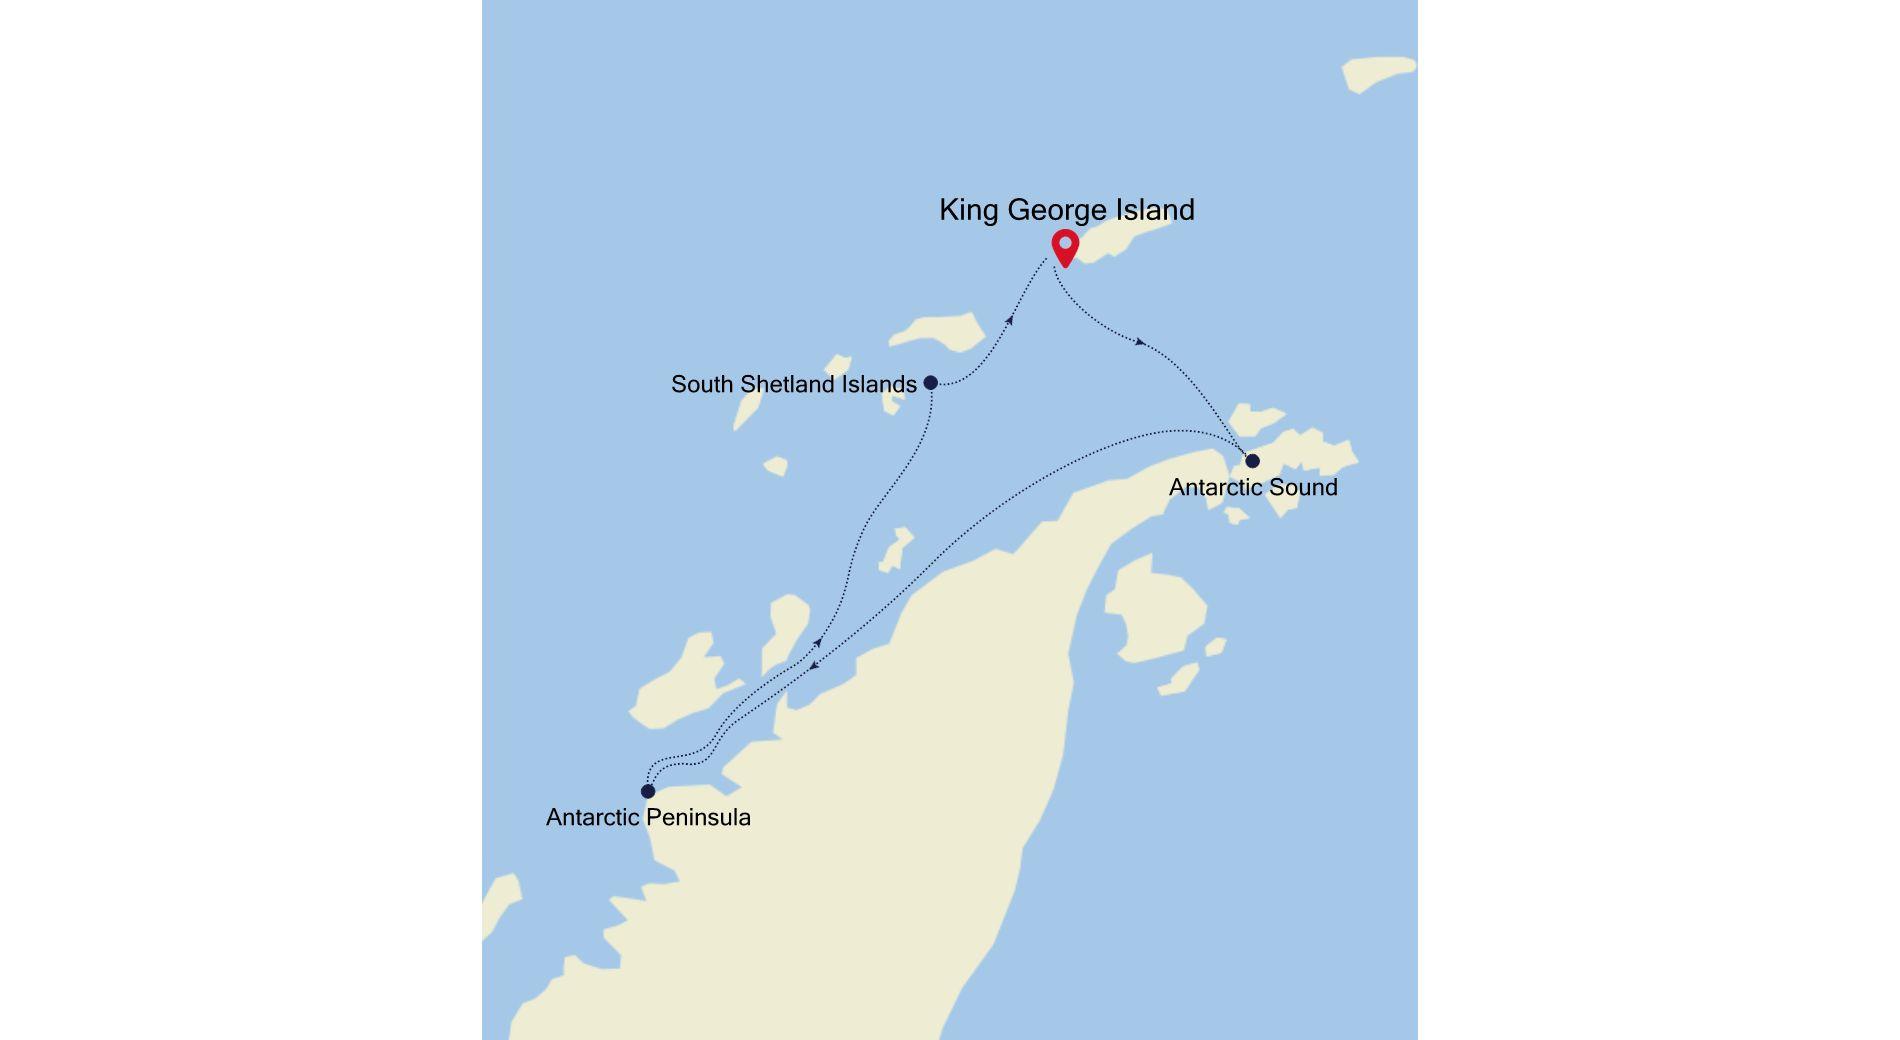 E1211211006 - King George Island to King George Island